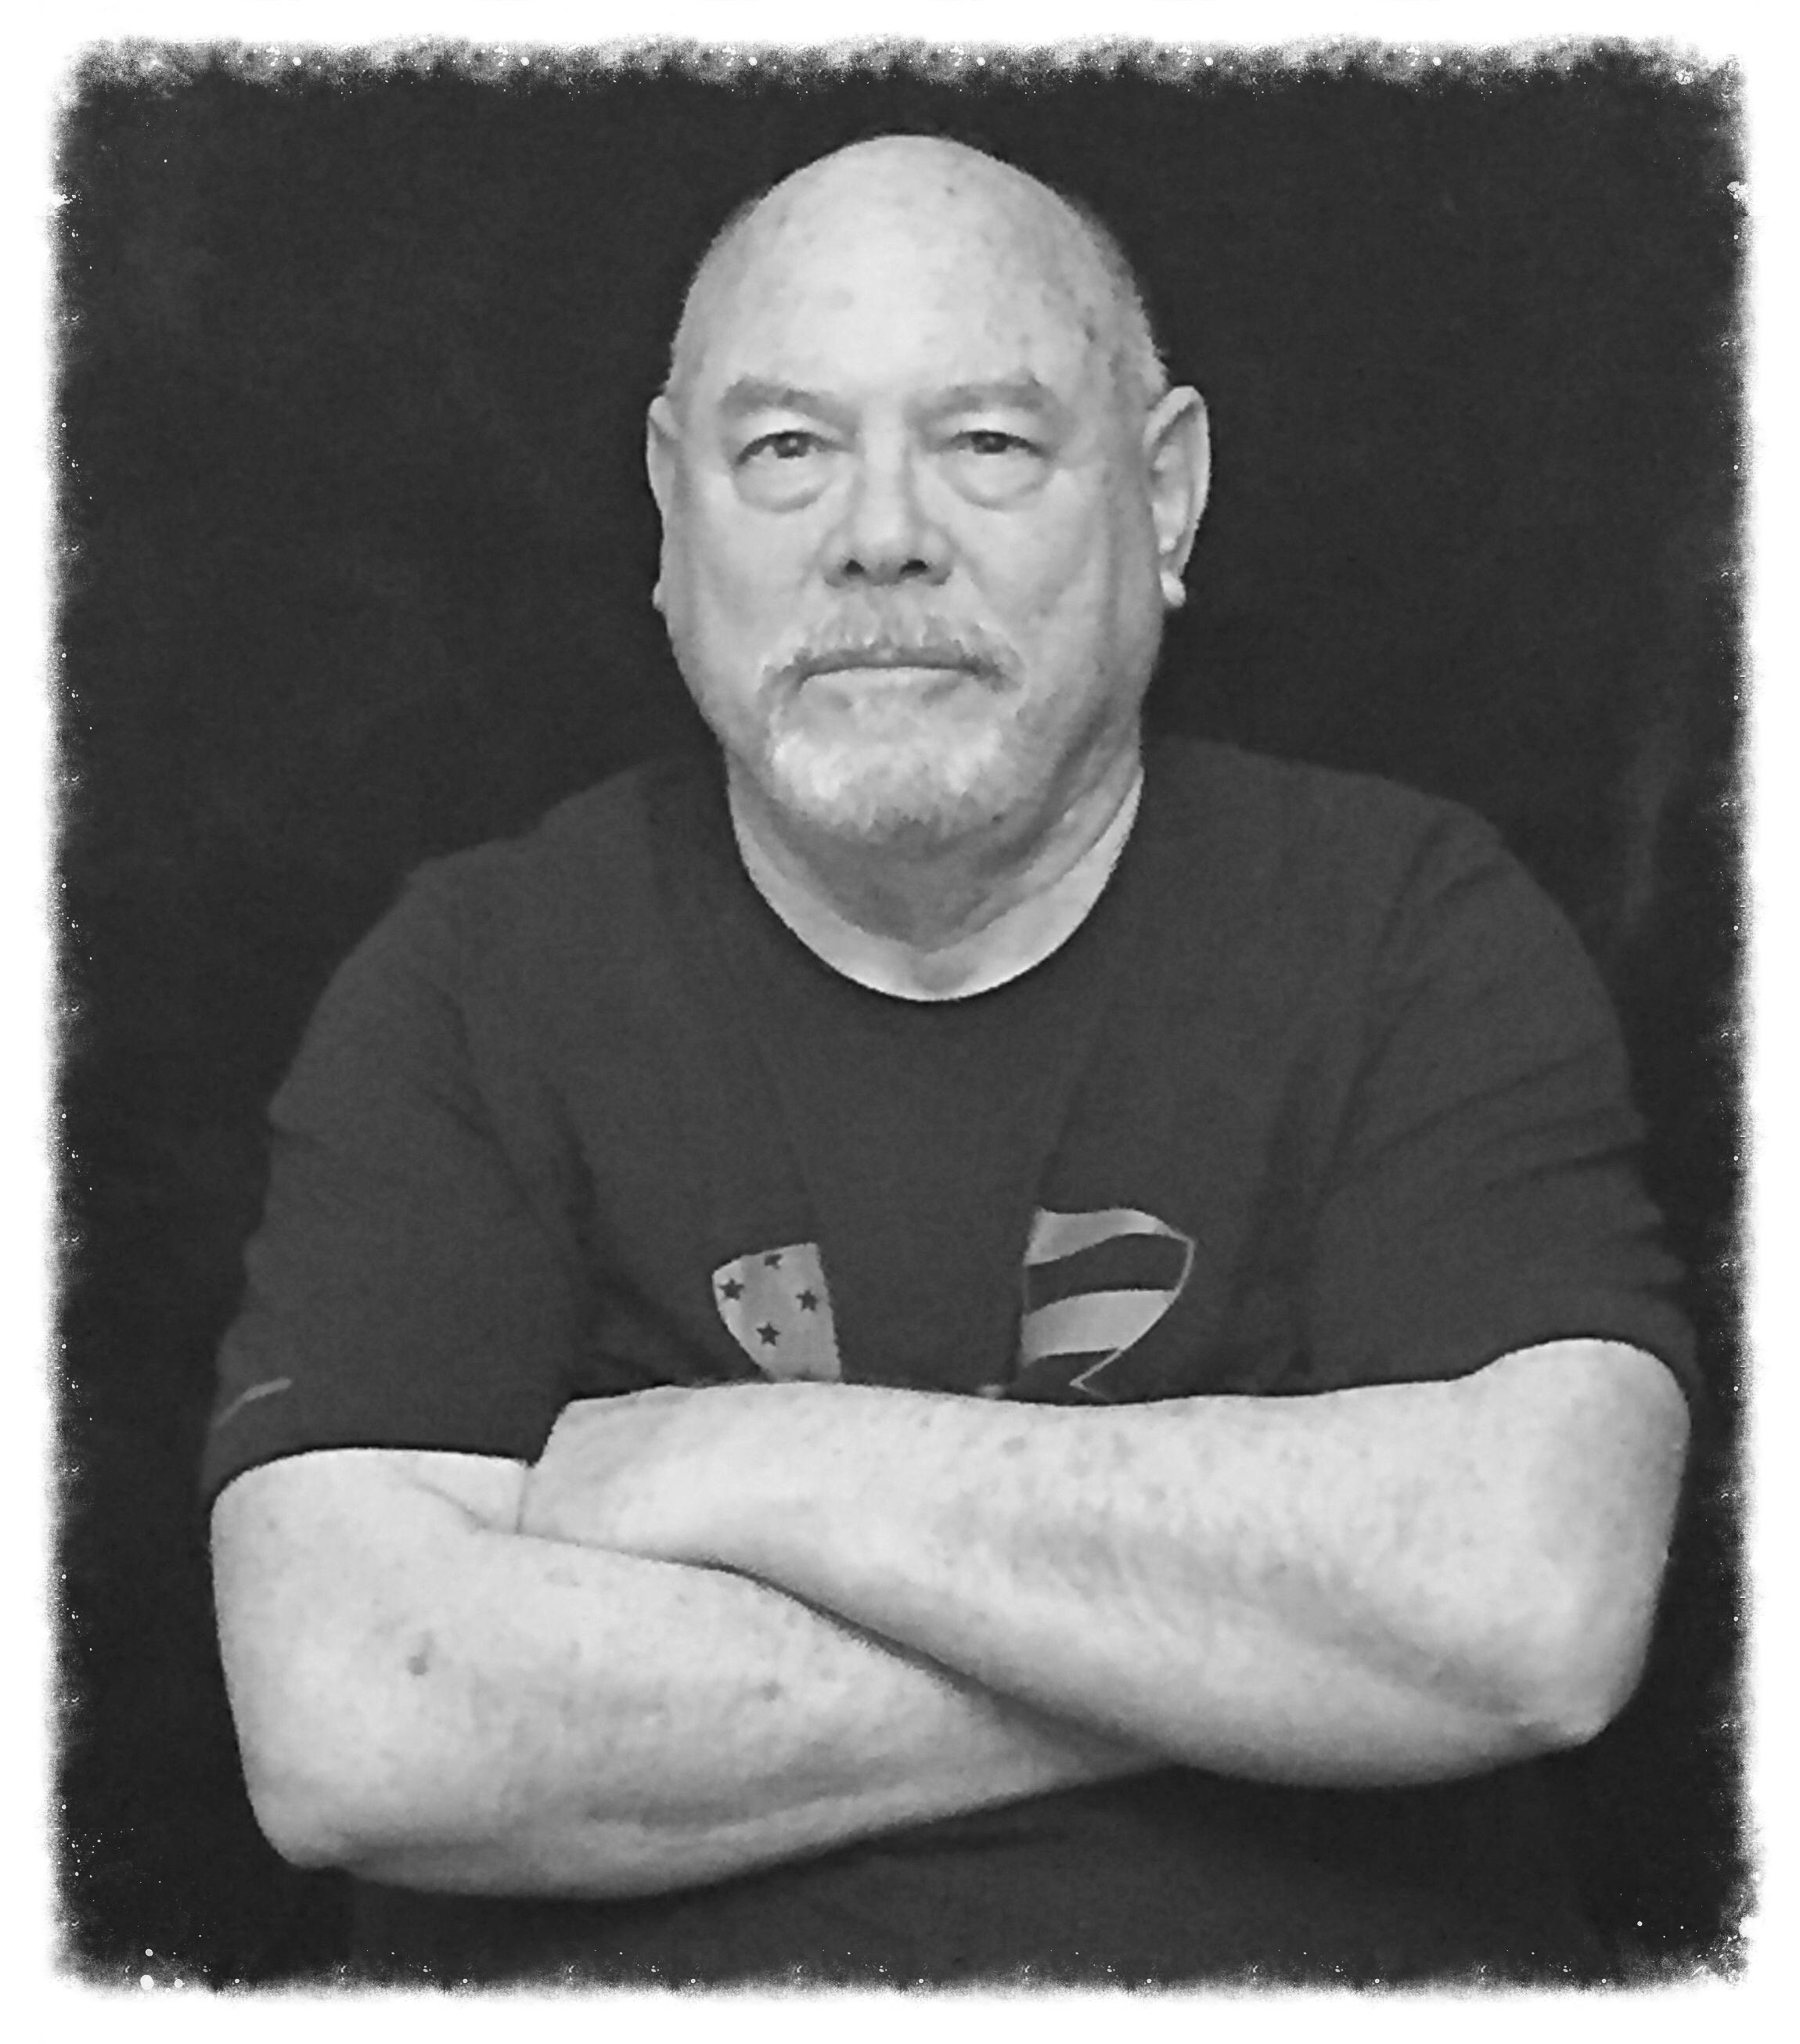 Jim Worrell